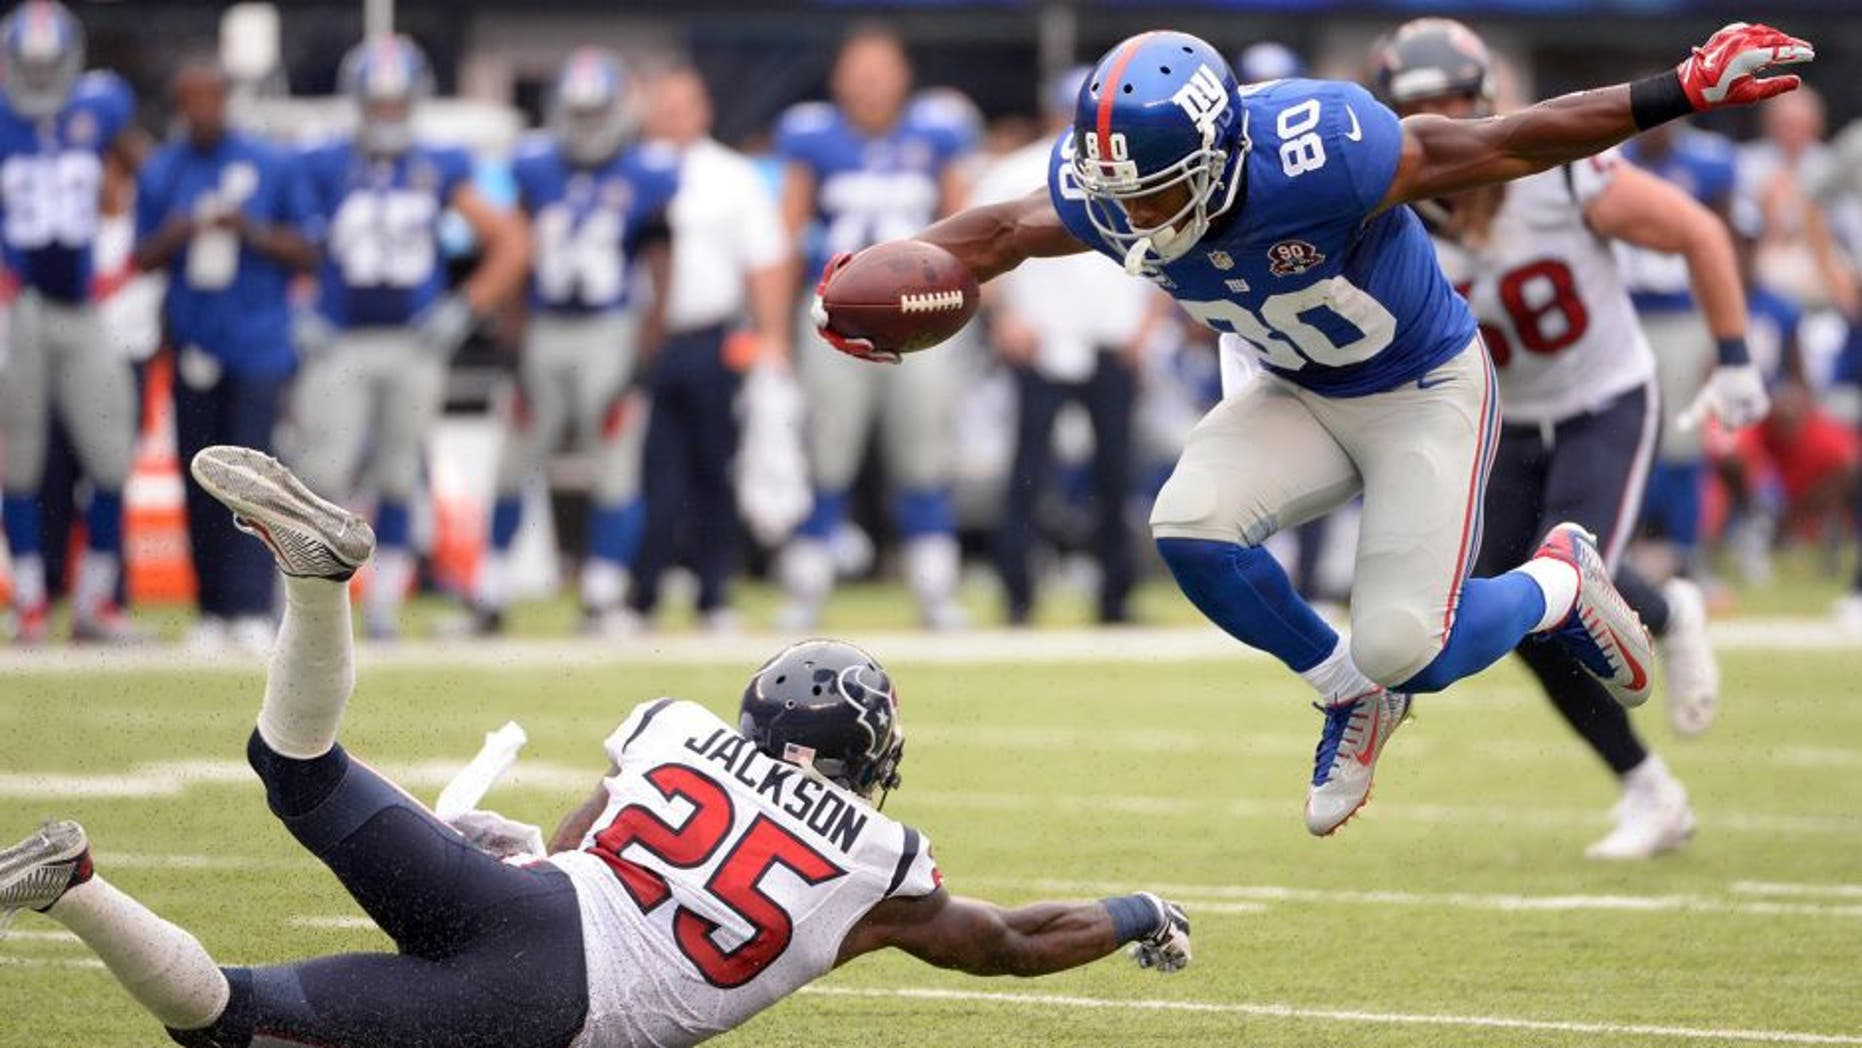 Sep 21, 2014; East Rutherford, NJ, USA; New York Giants wide receiver Victor Cruz (80) scores a touchdown past Houston Texans cornerback Kareem Jackson (25) at MetLife Stadium. Mandatory Credit: Robert Deutsch-USA TODAY Sports